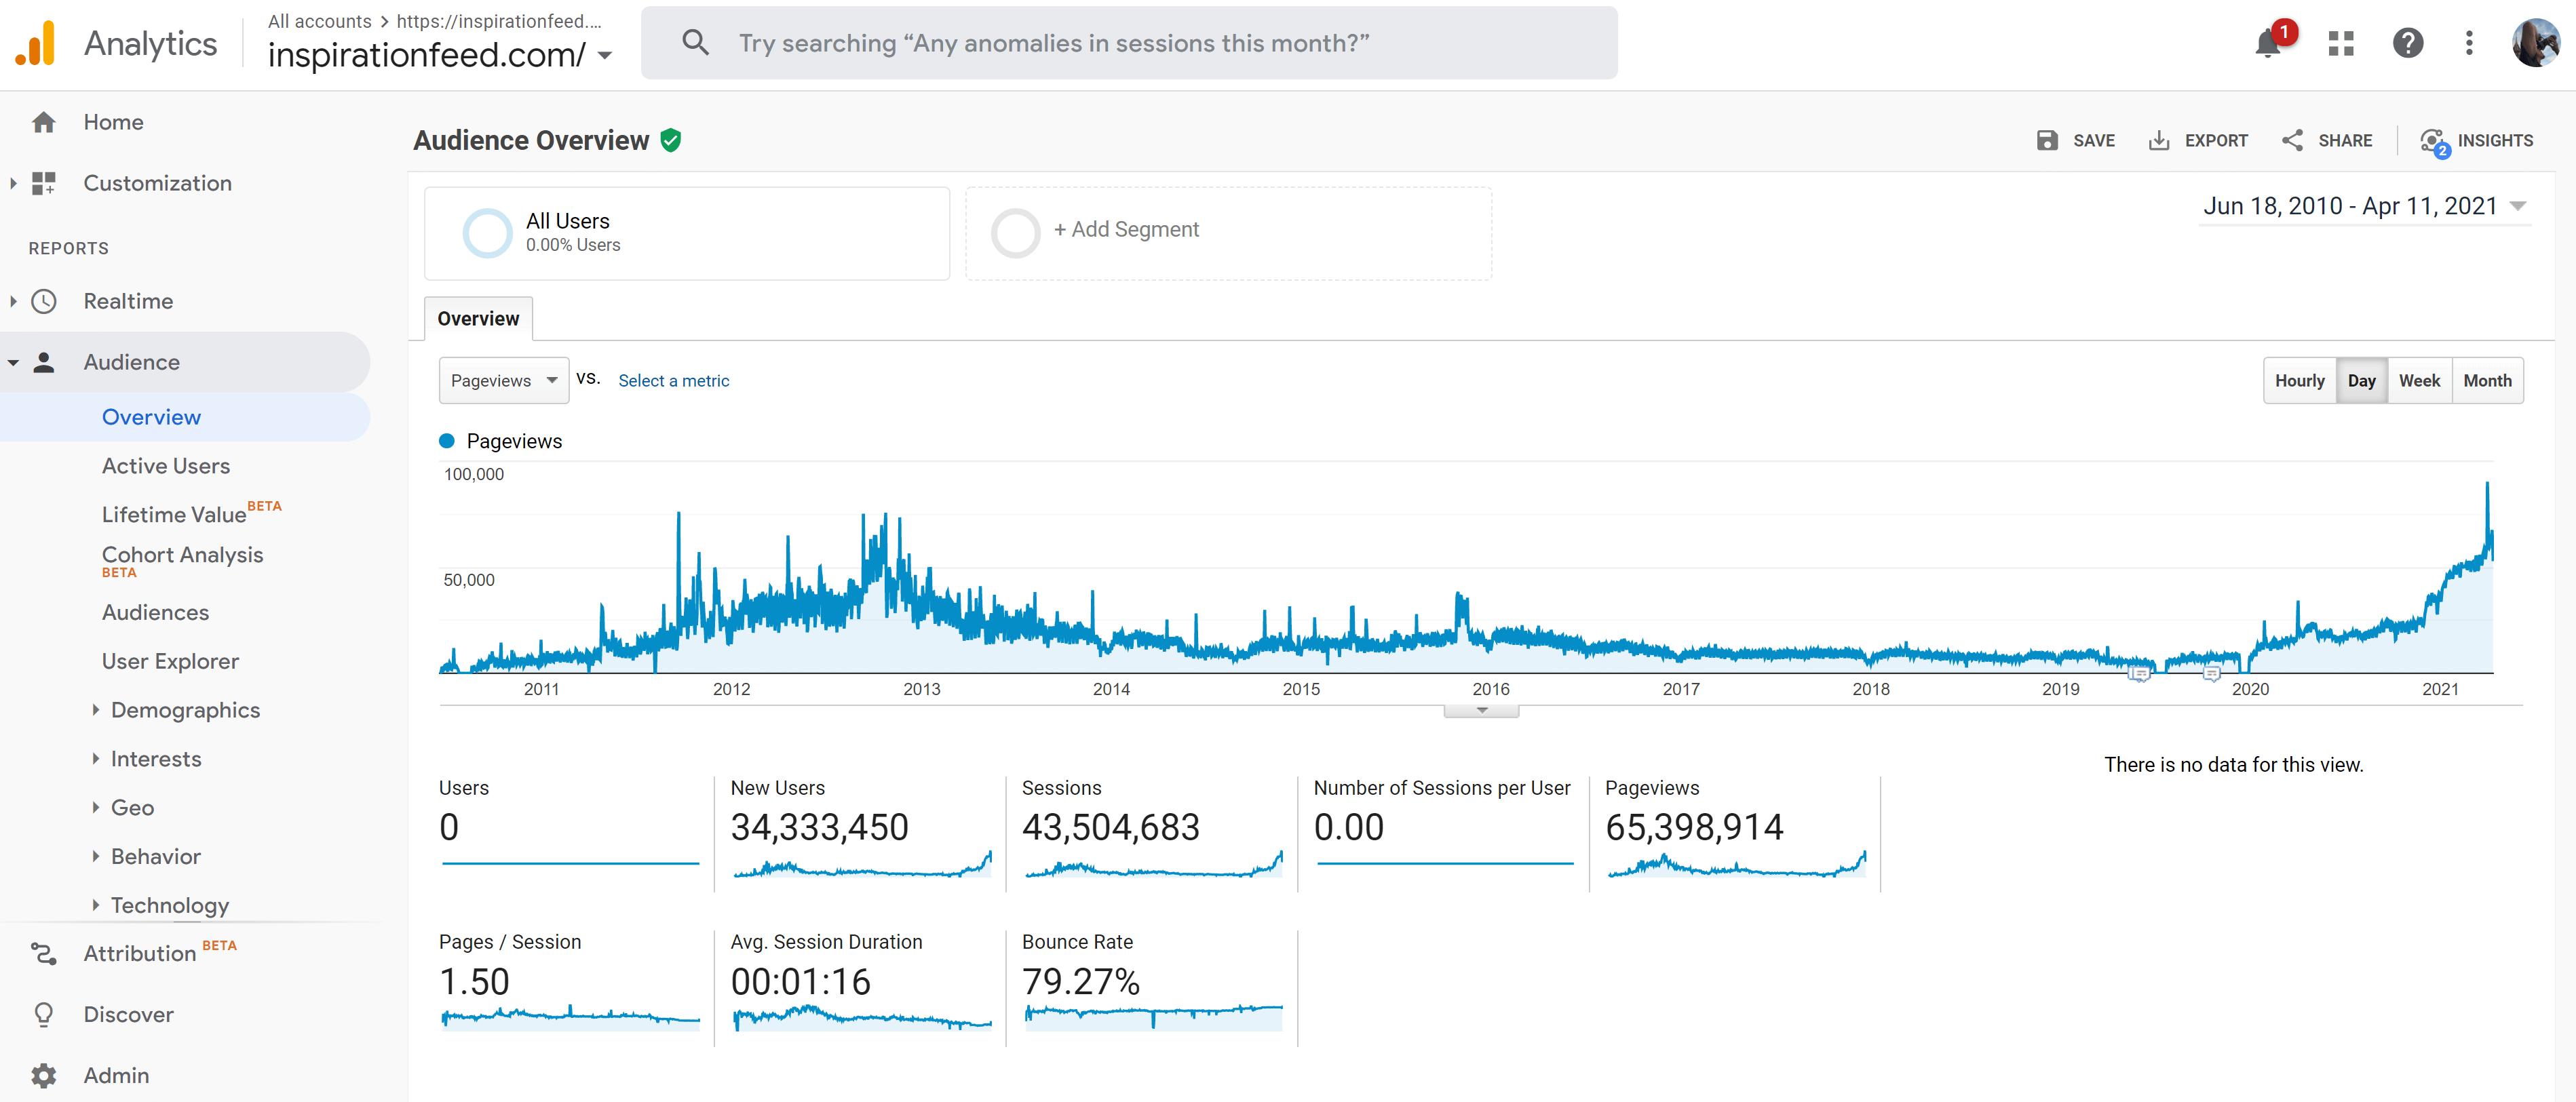 Inspirationfeed Google Analytics April 2021